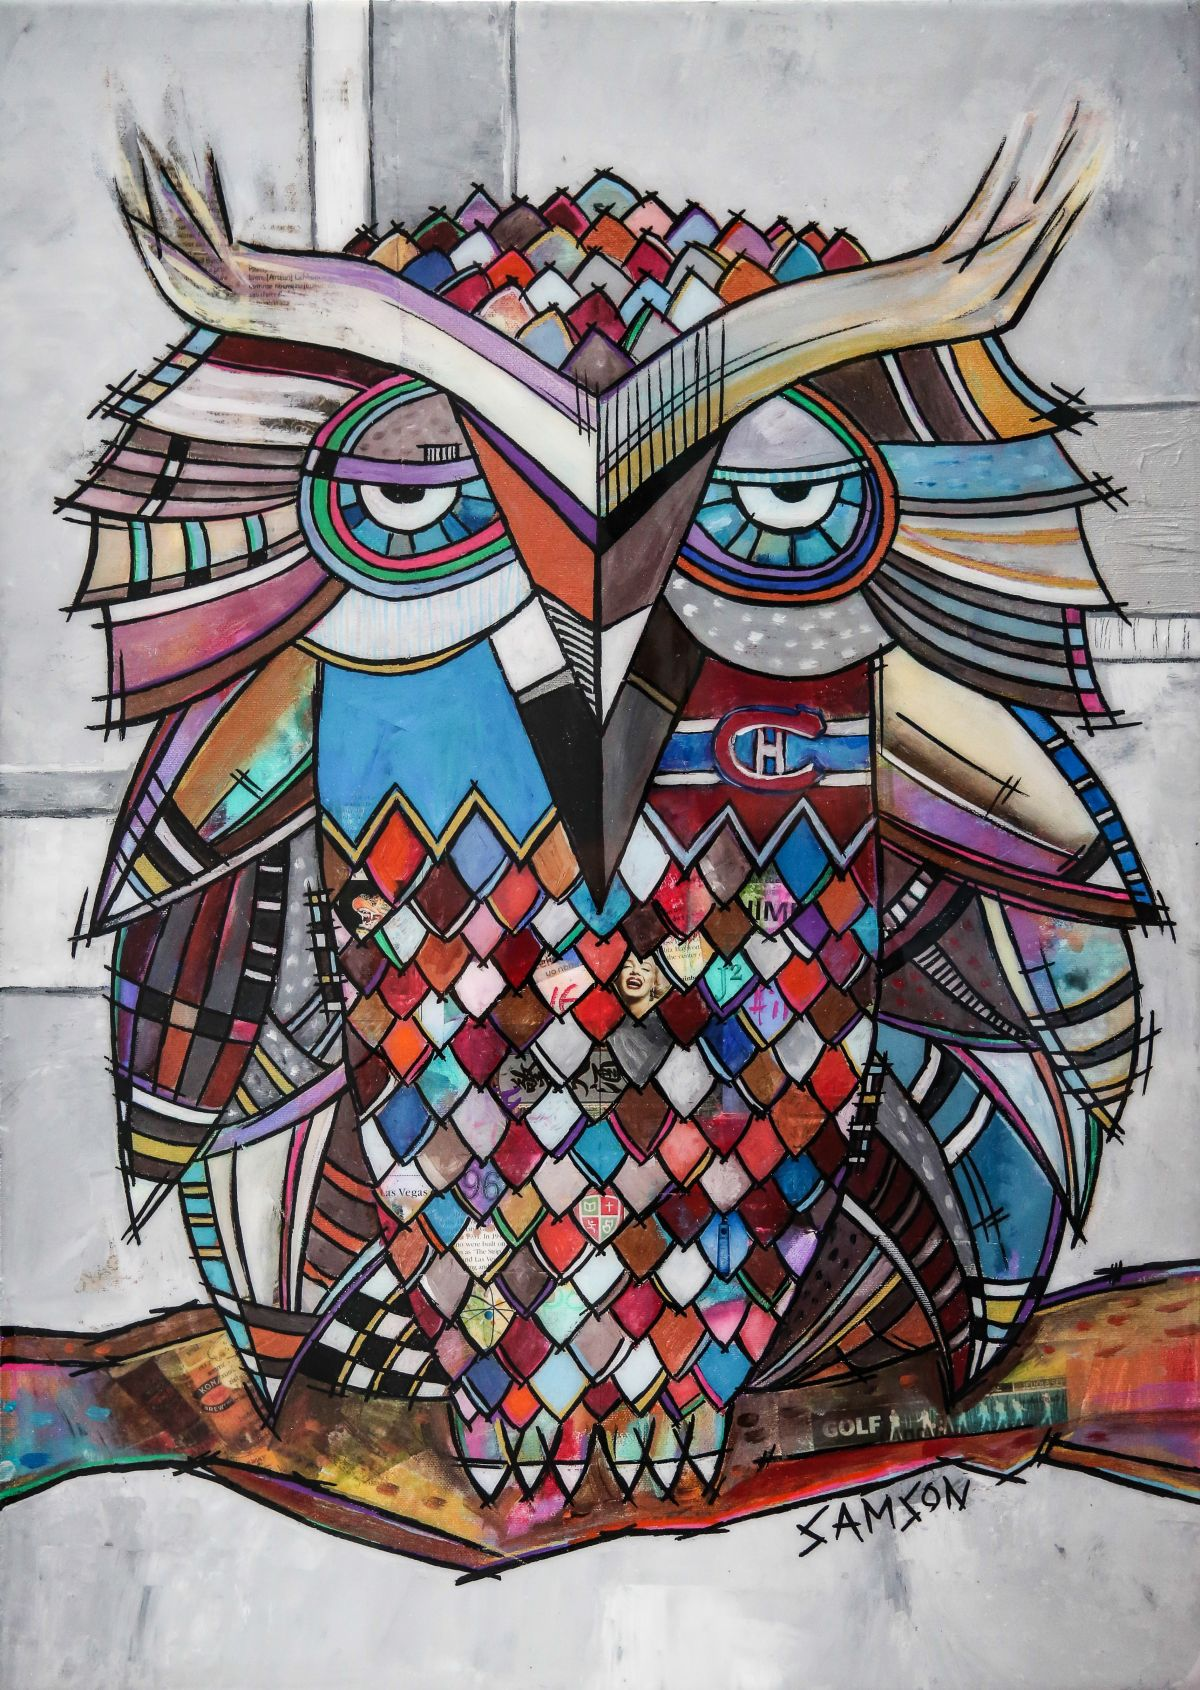 Bien connu Owl Art: Paintings & Artwork on canvas by Marc Samson. EM96